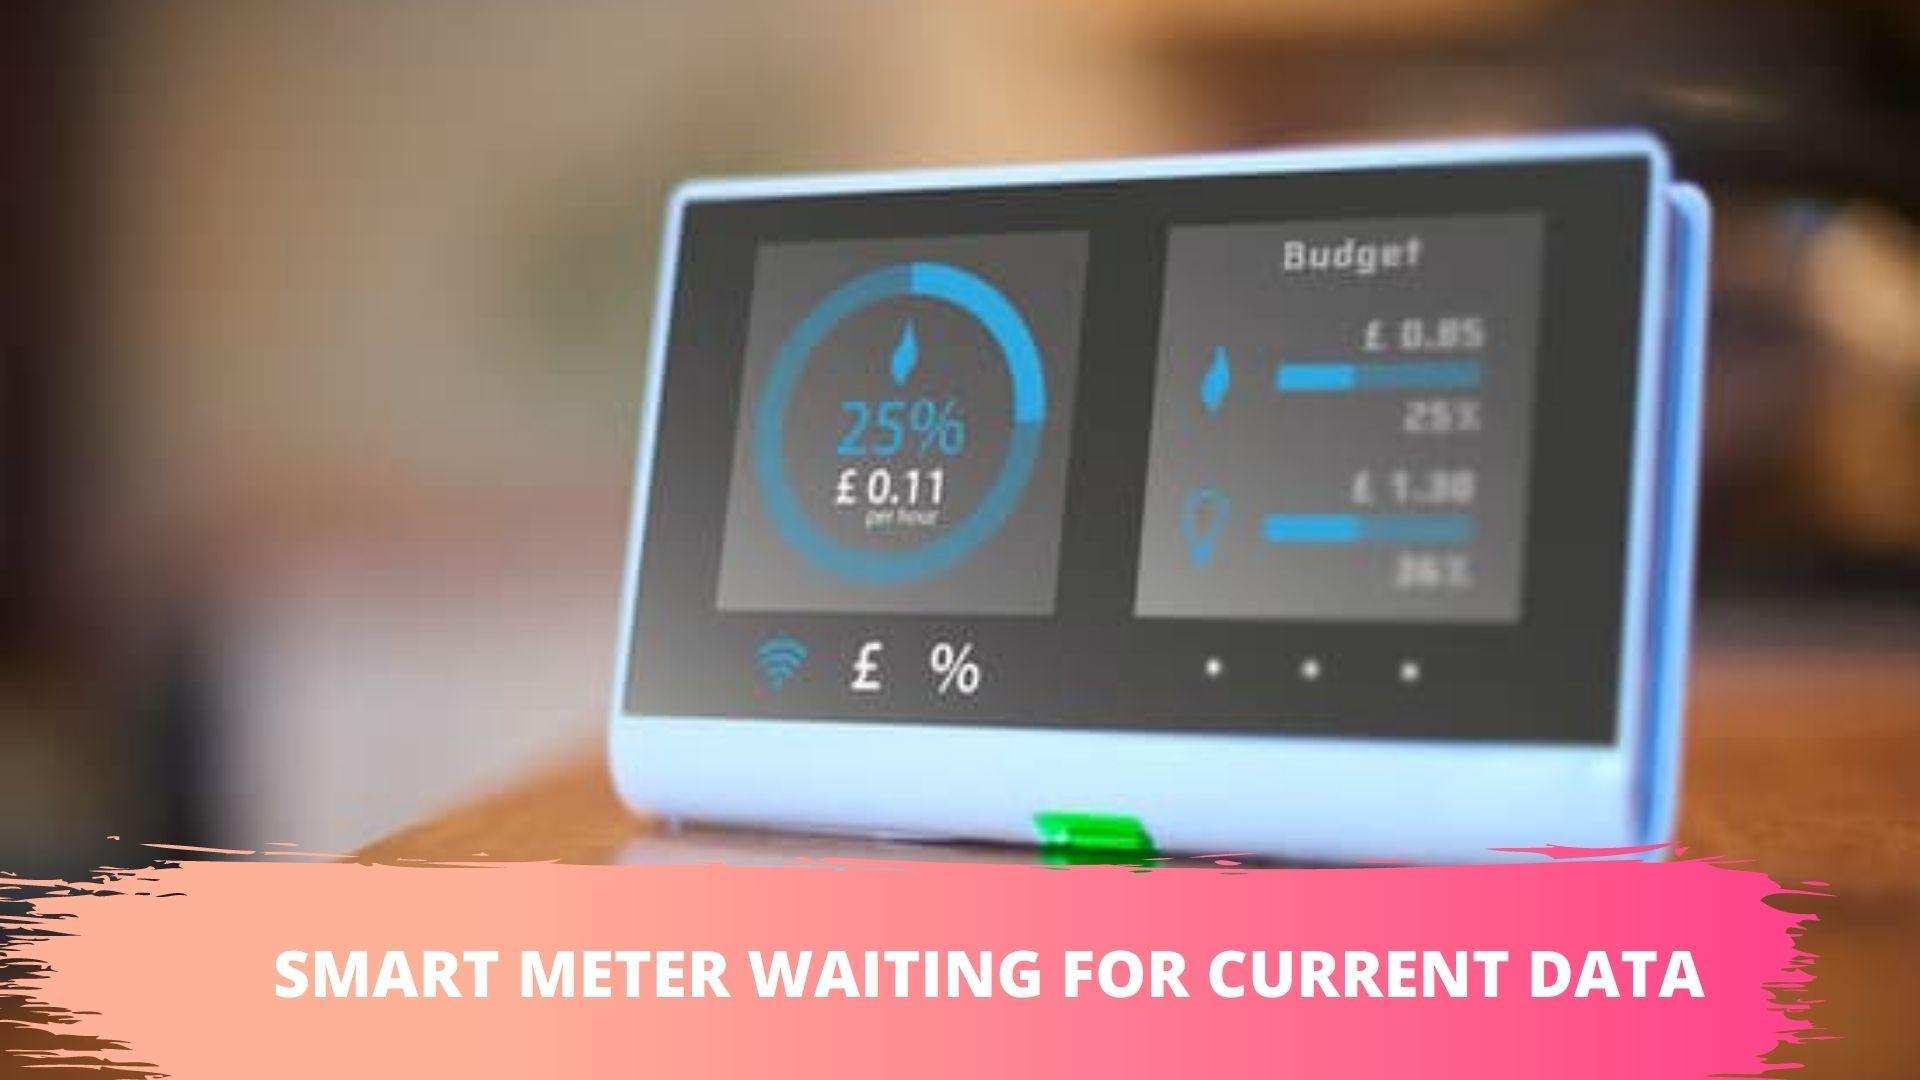 eon, edf,chameleon, scottish power, npower, ovo, octopus, bulb smart meter waiting for current data